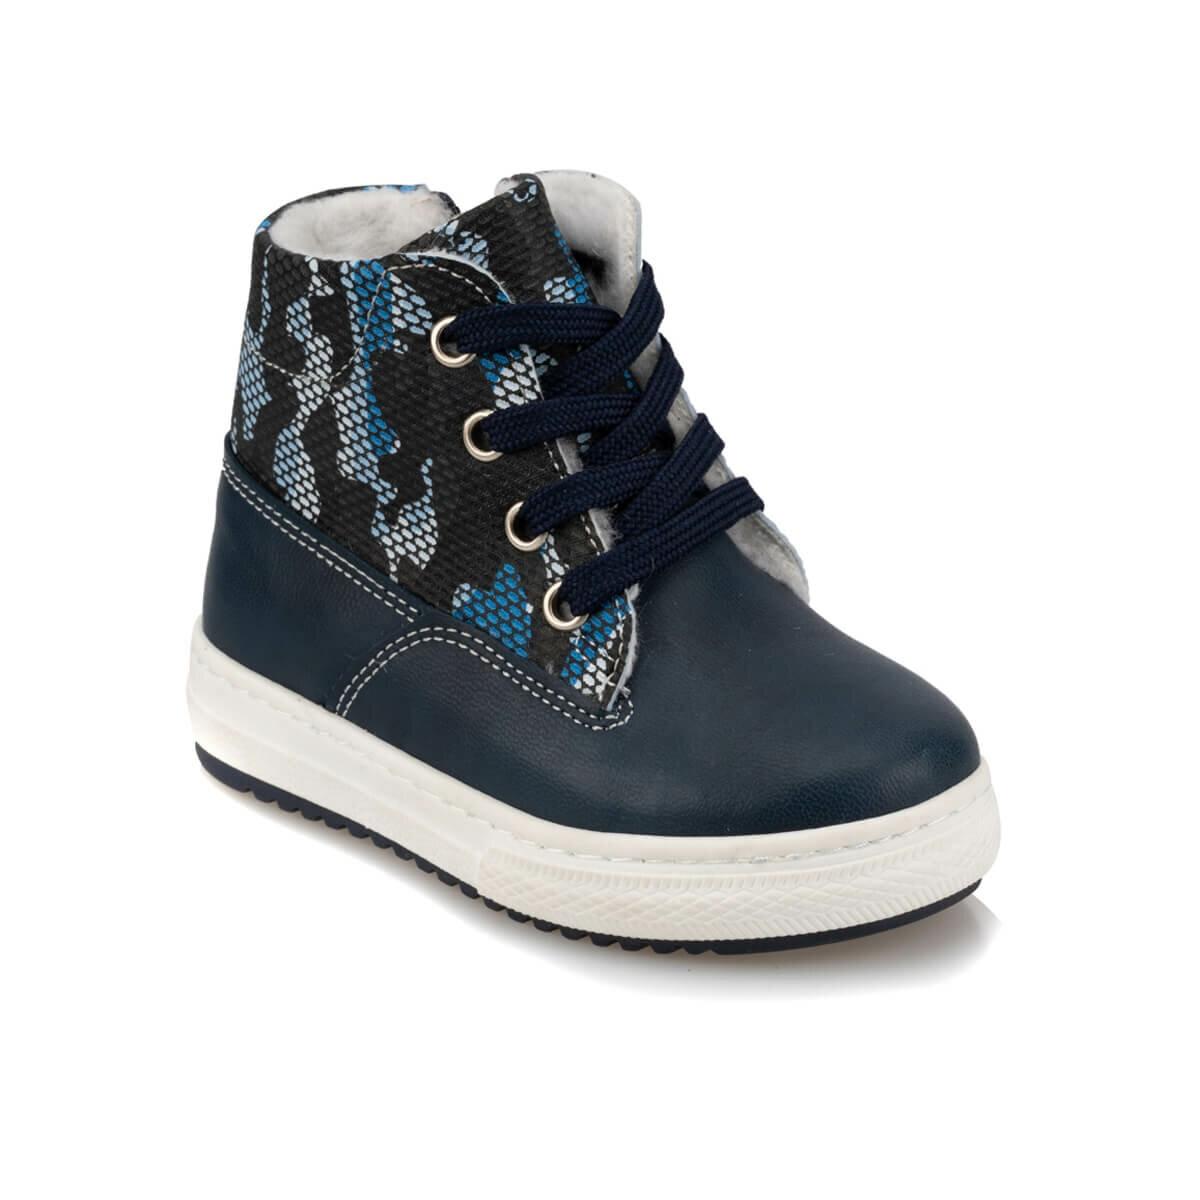 FLO 92.511729.B Navy Blue Male Child Boots Polaris